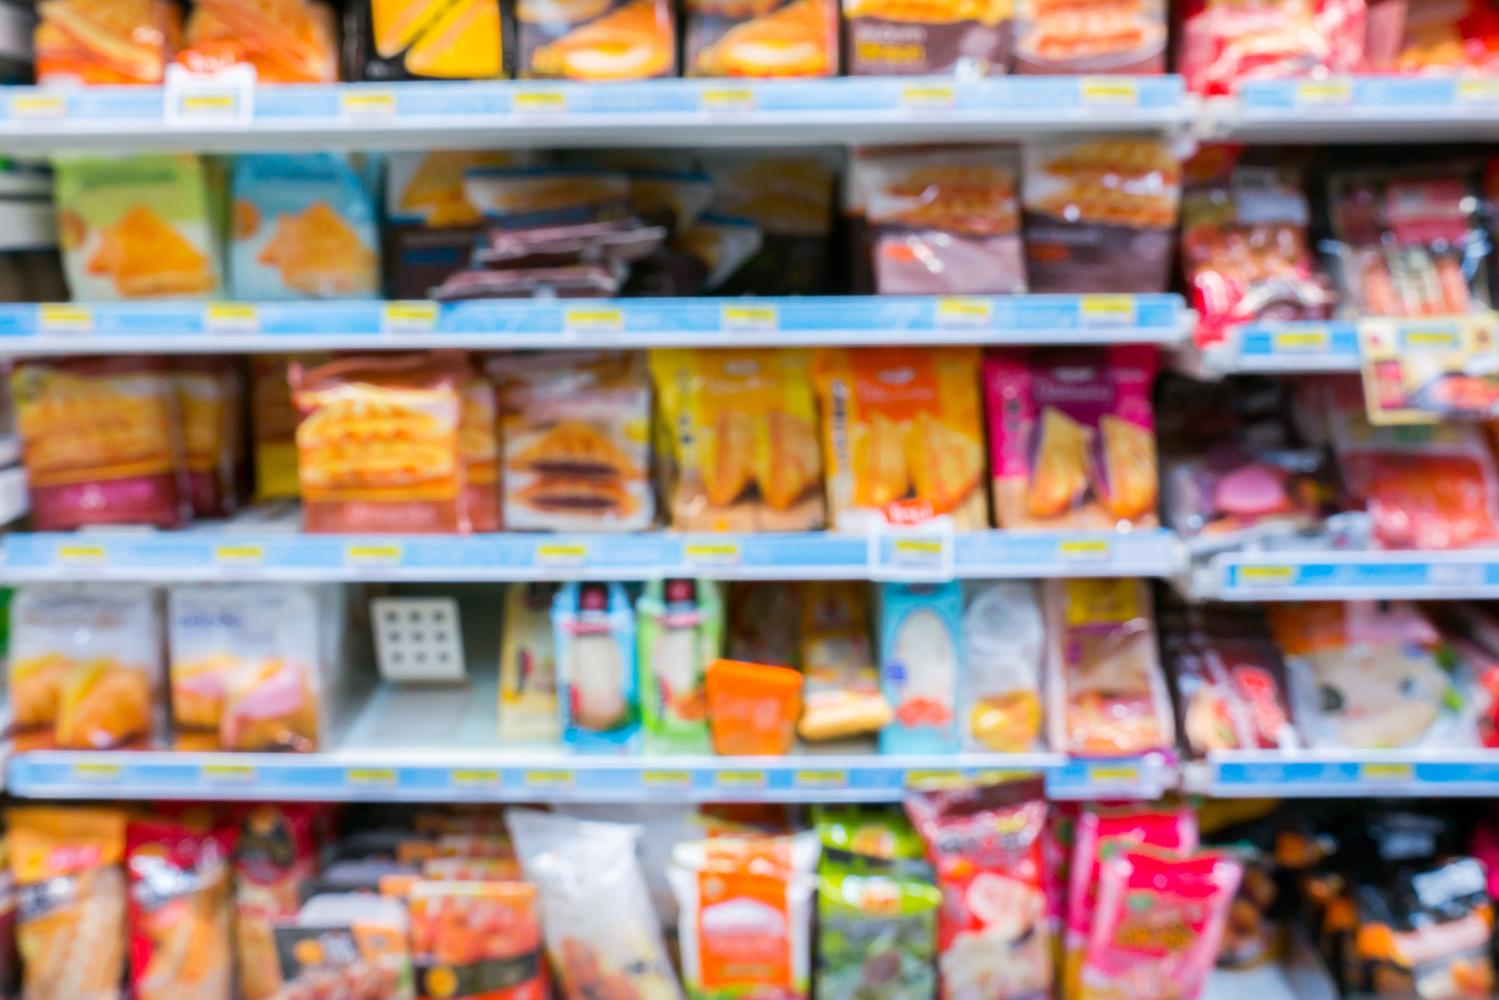 product shelfs